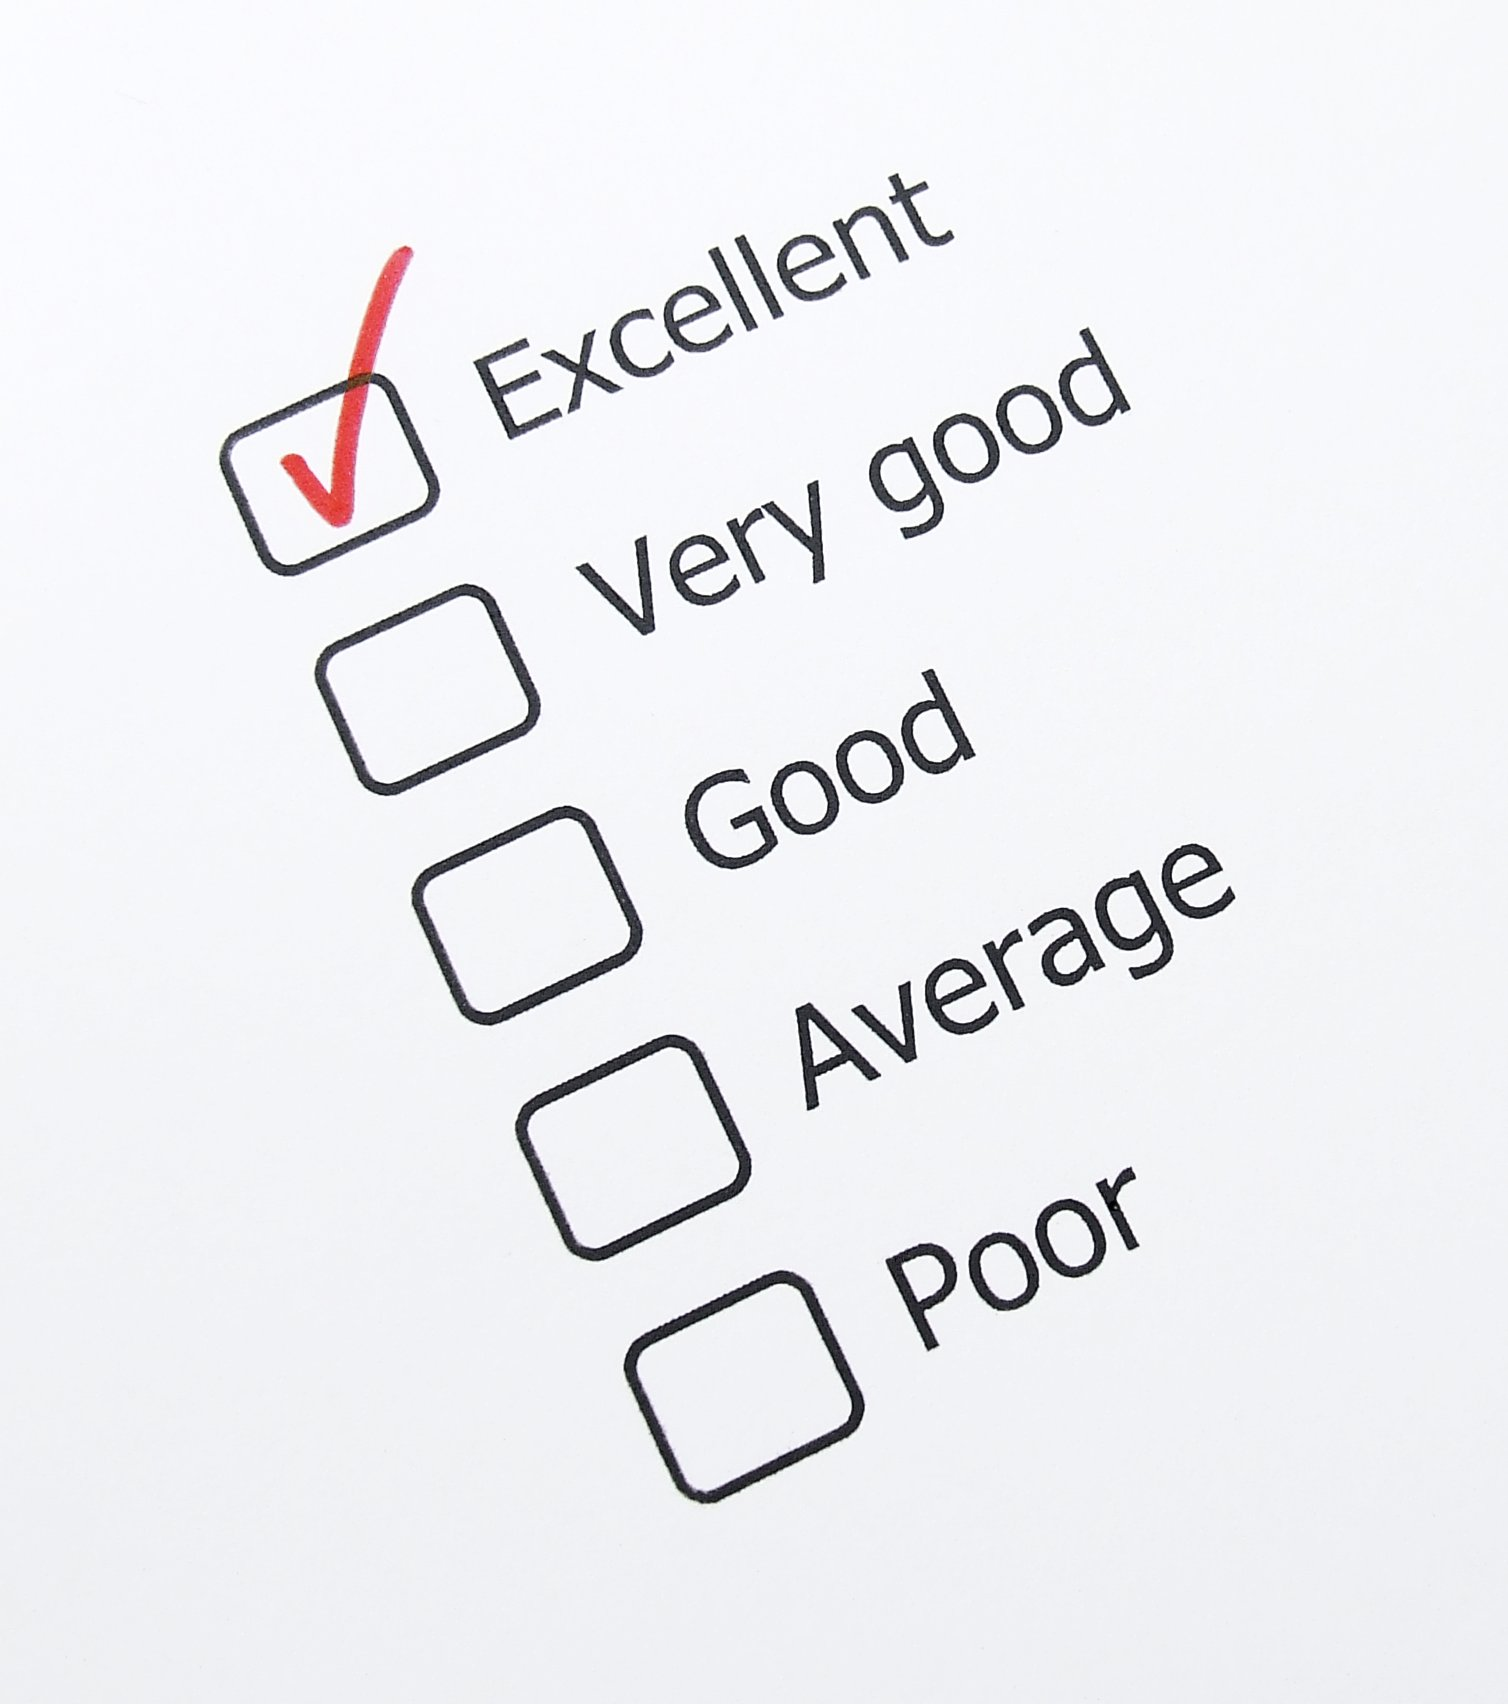 innovative roofs feedback